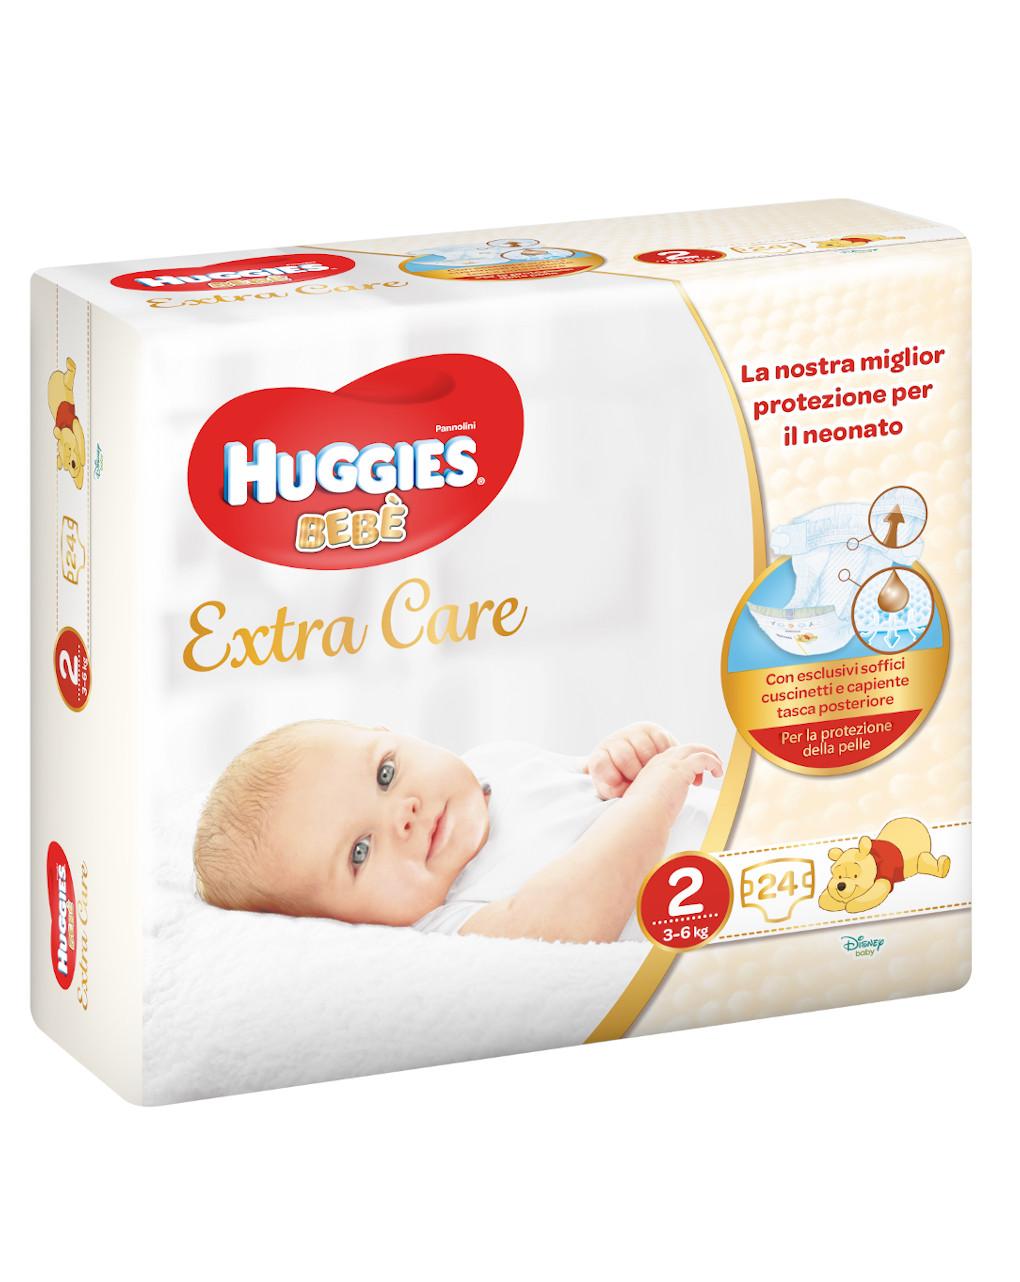 Huggies bebè extra care (3-6kg) - 24 pz - Huggies